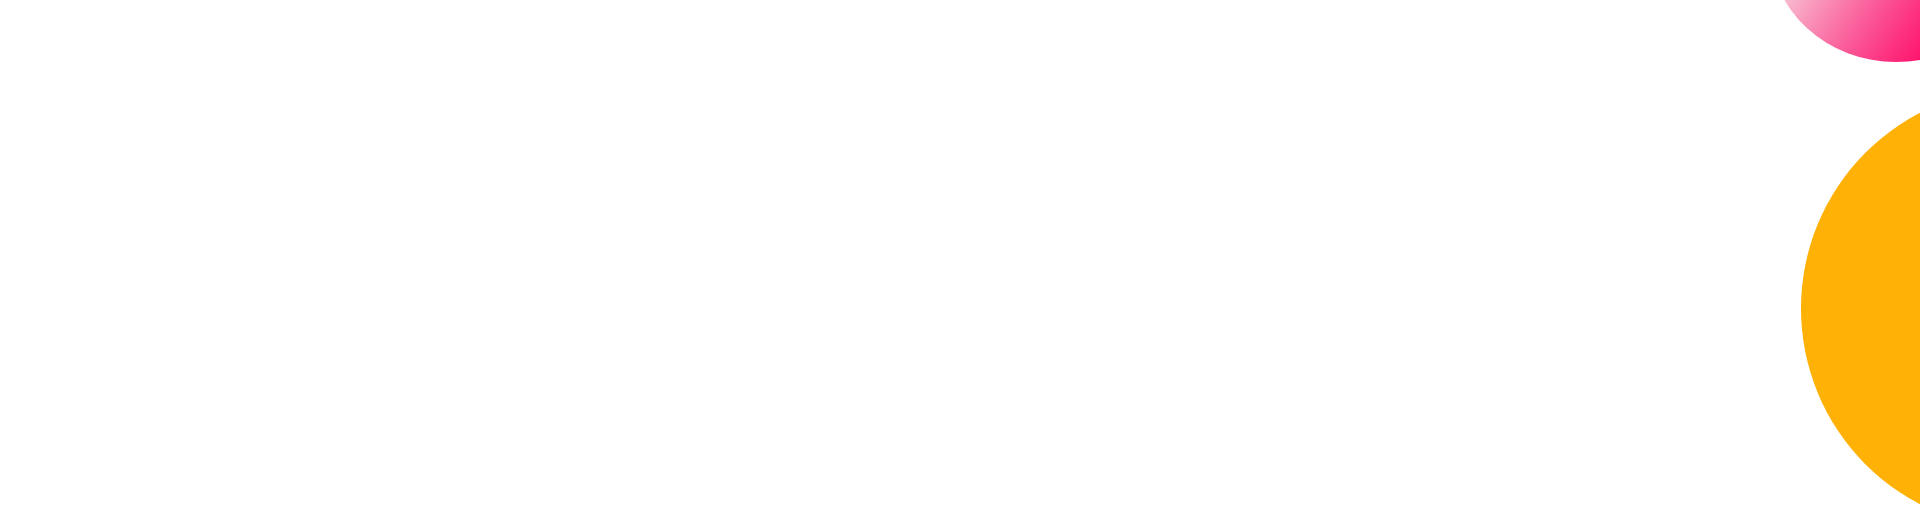 kugel1